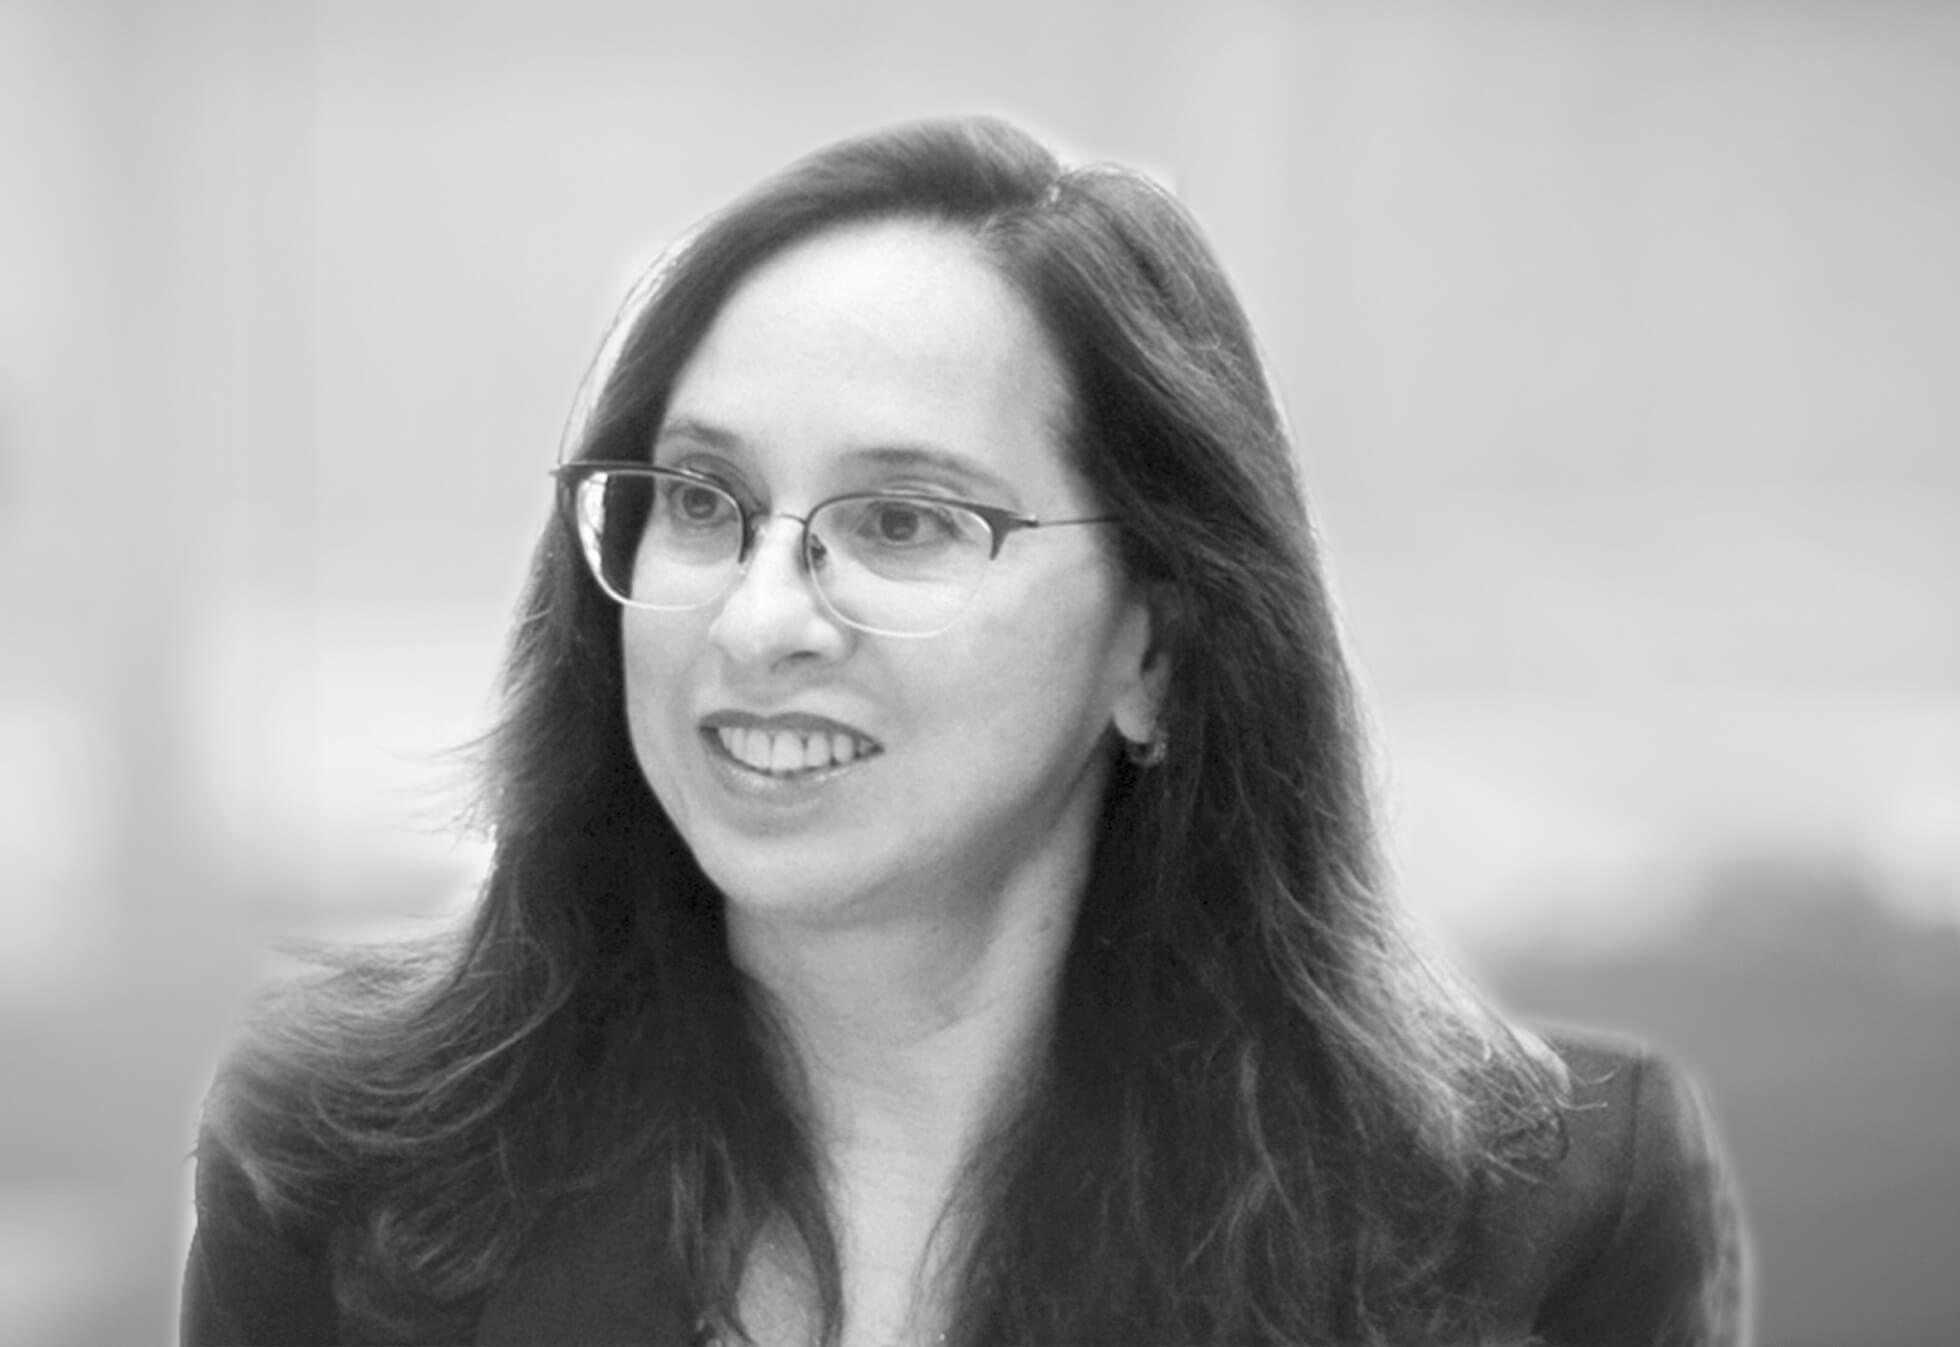 Sheila Mikhail